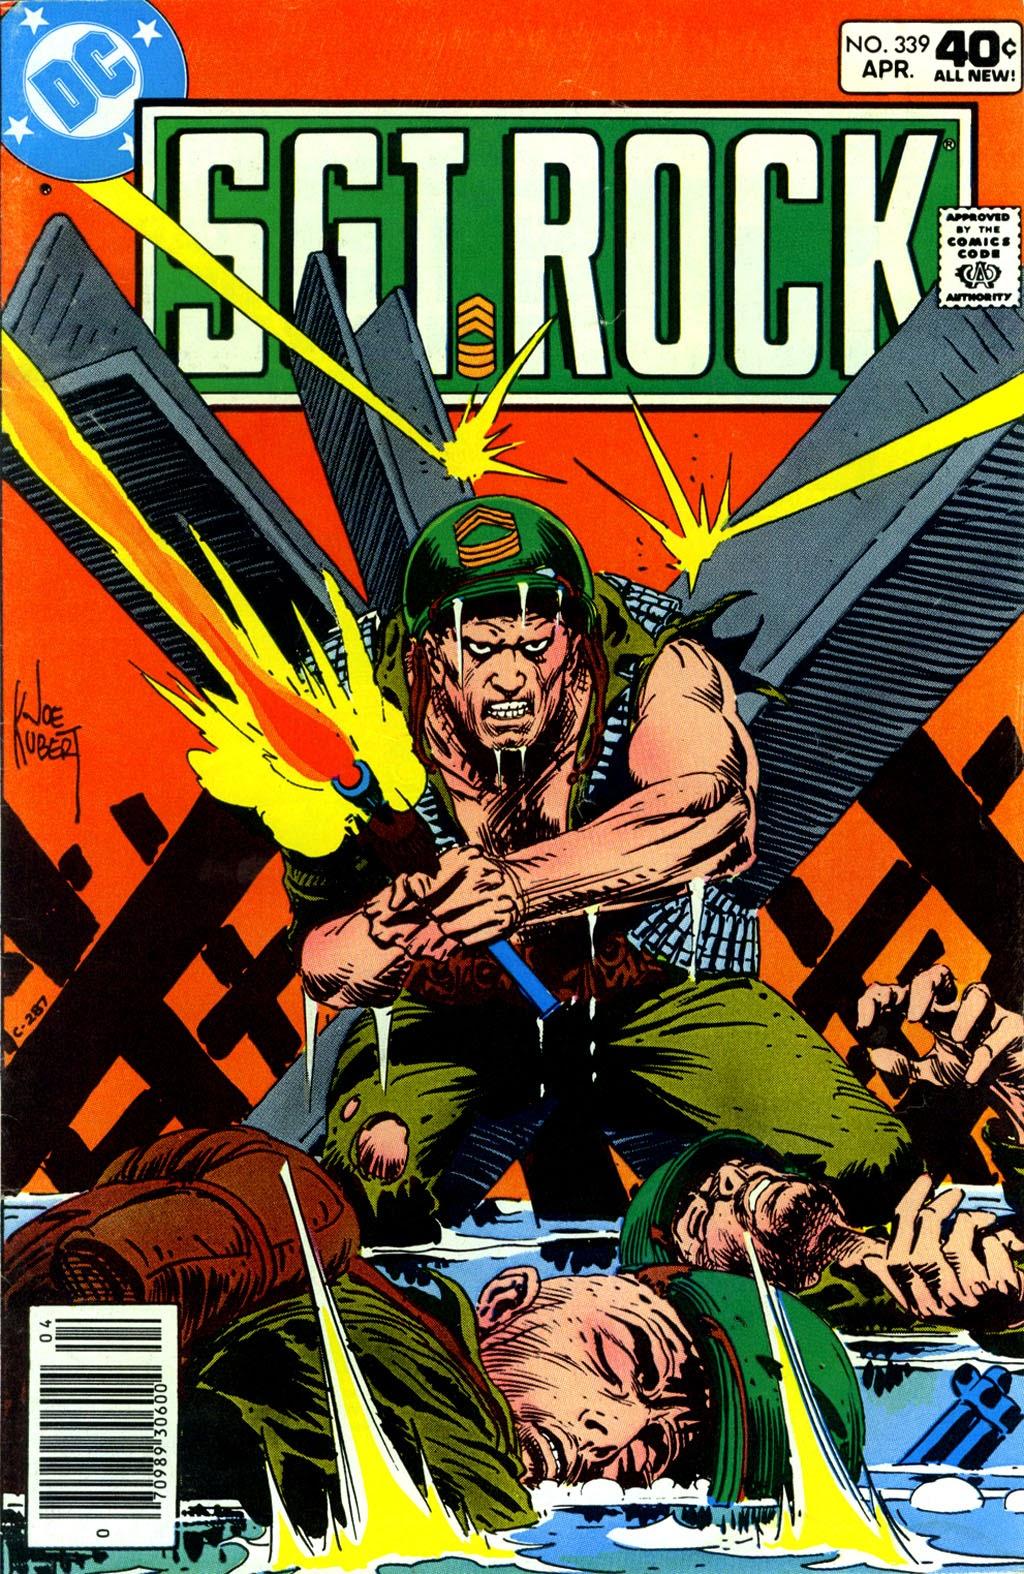 Read online Sgt. Rock comic -  Issue #339 - 1